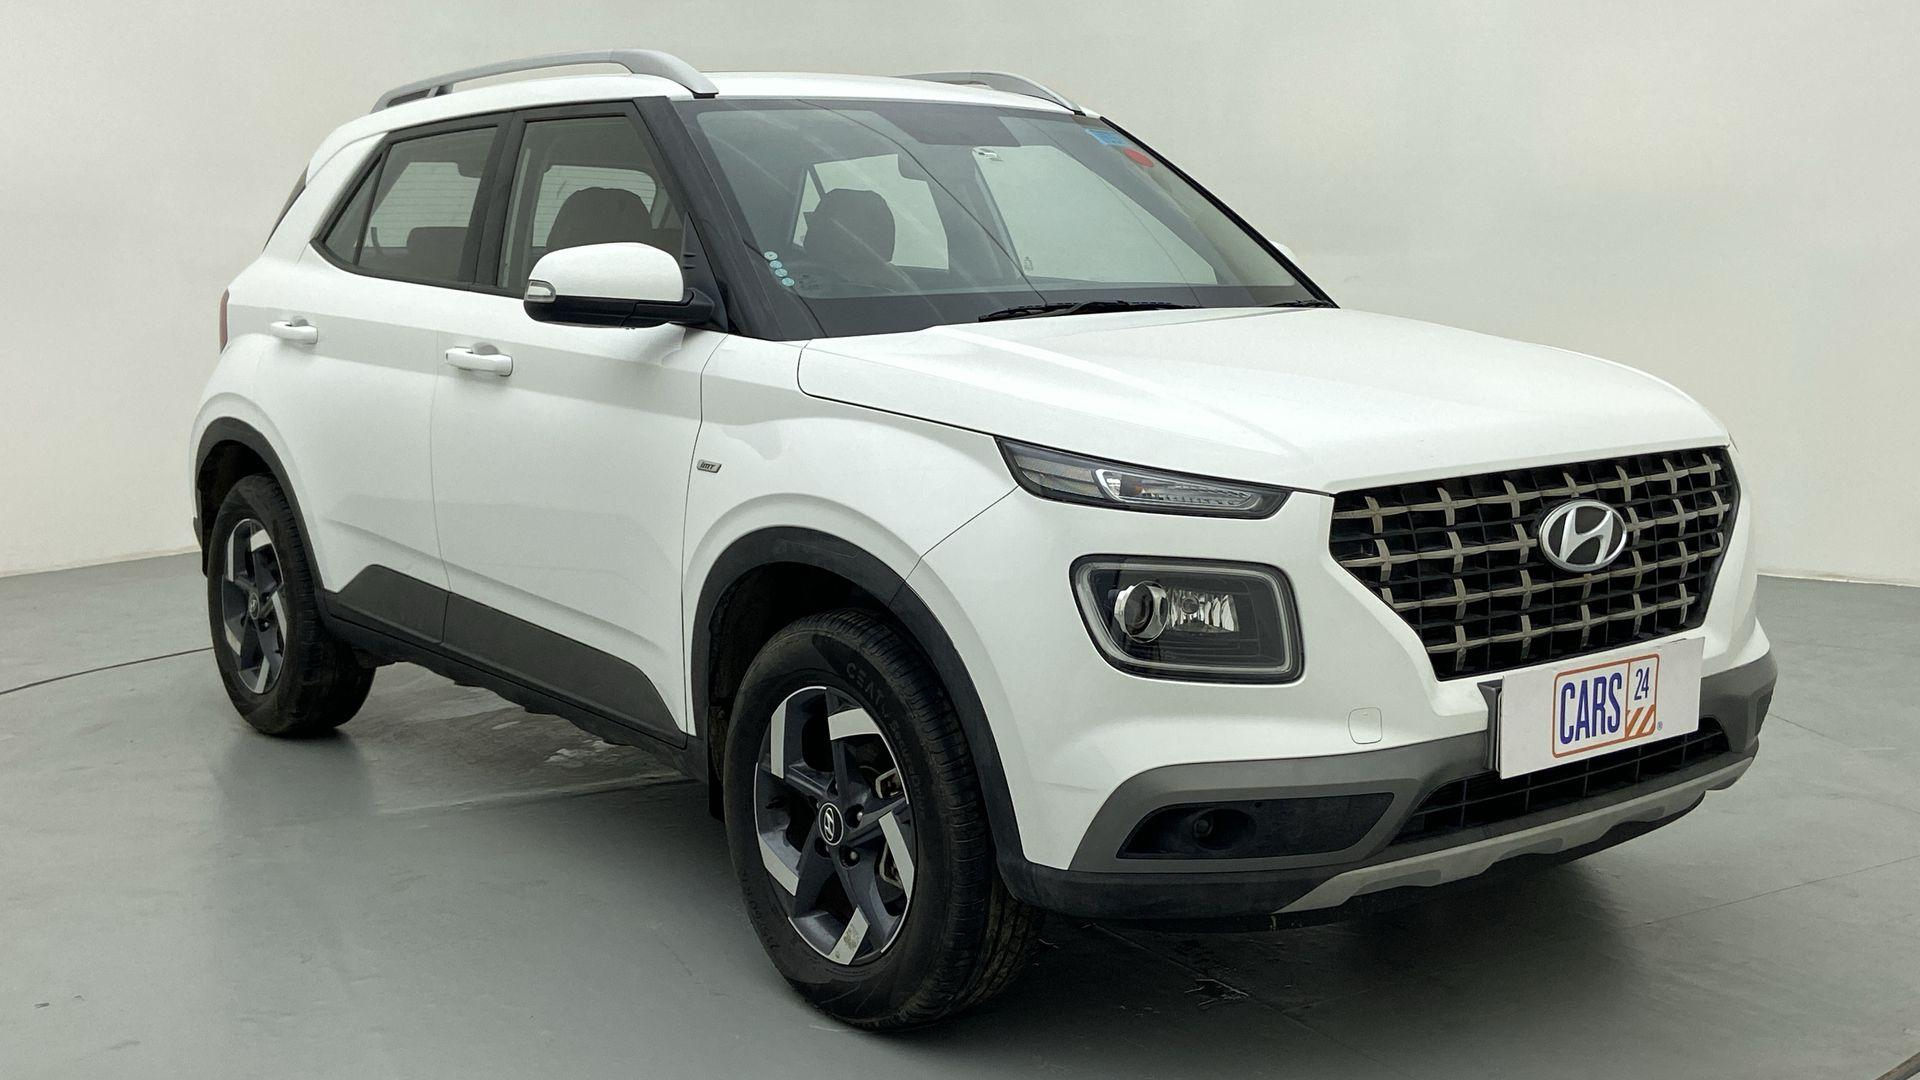 2020 Hyundai VENUE SX 1.0 GDI IMT